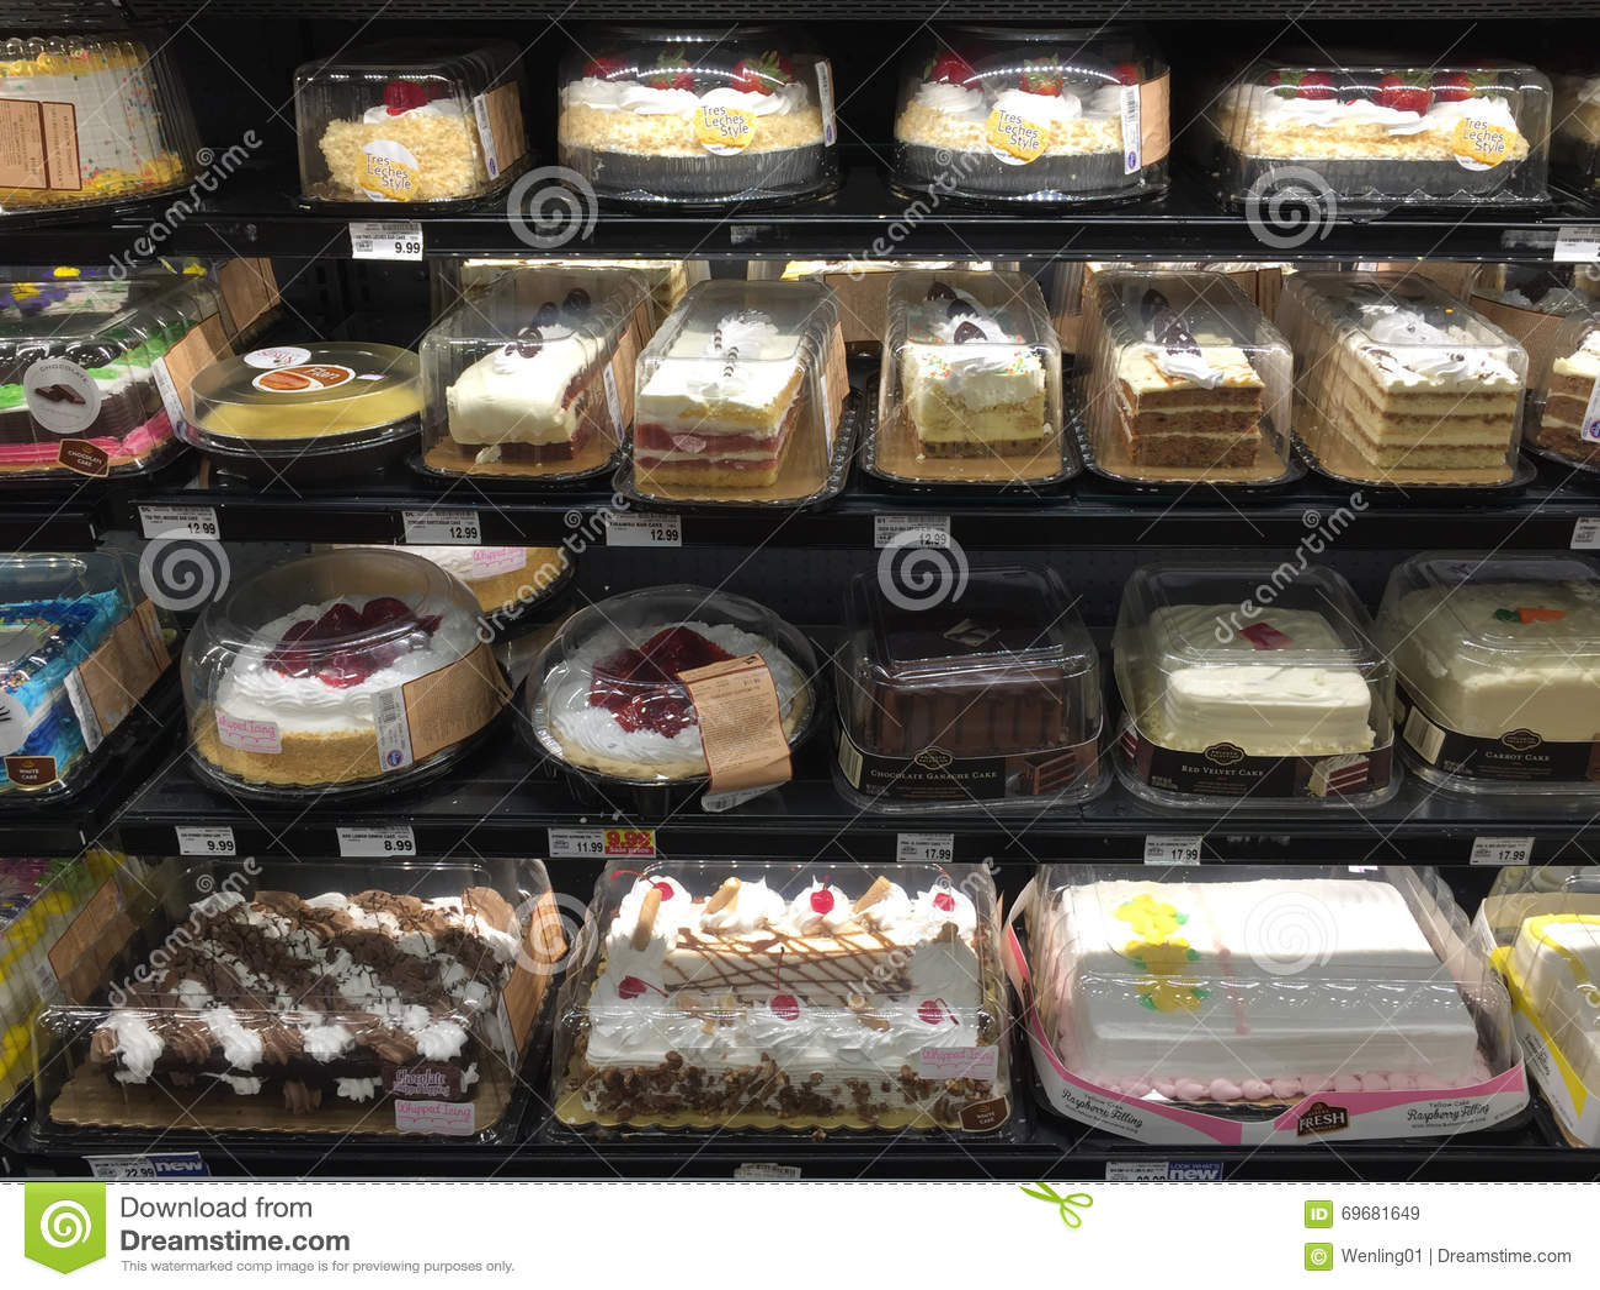 Fabulous Birthday Cakes In Refrigerator Selling Editorial Stock Image Funny Birthday Cards Online Hetedamsfinfo